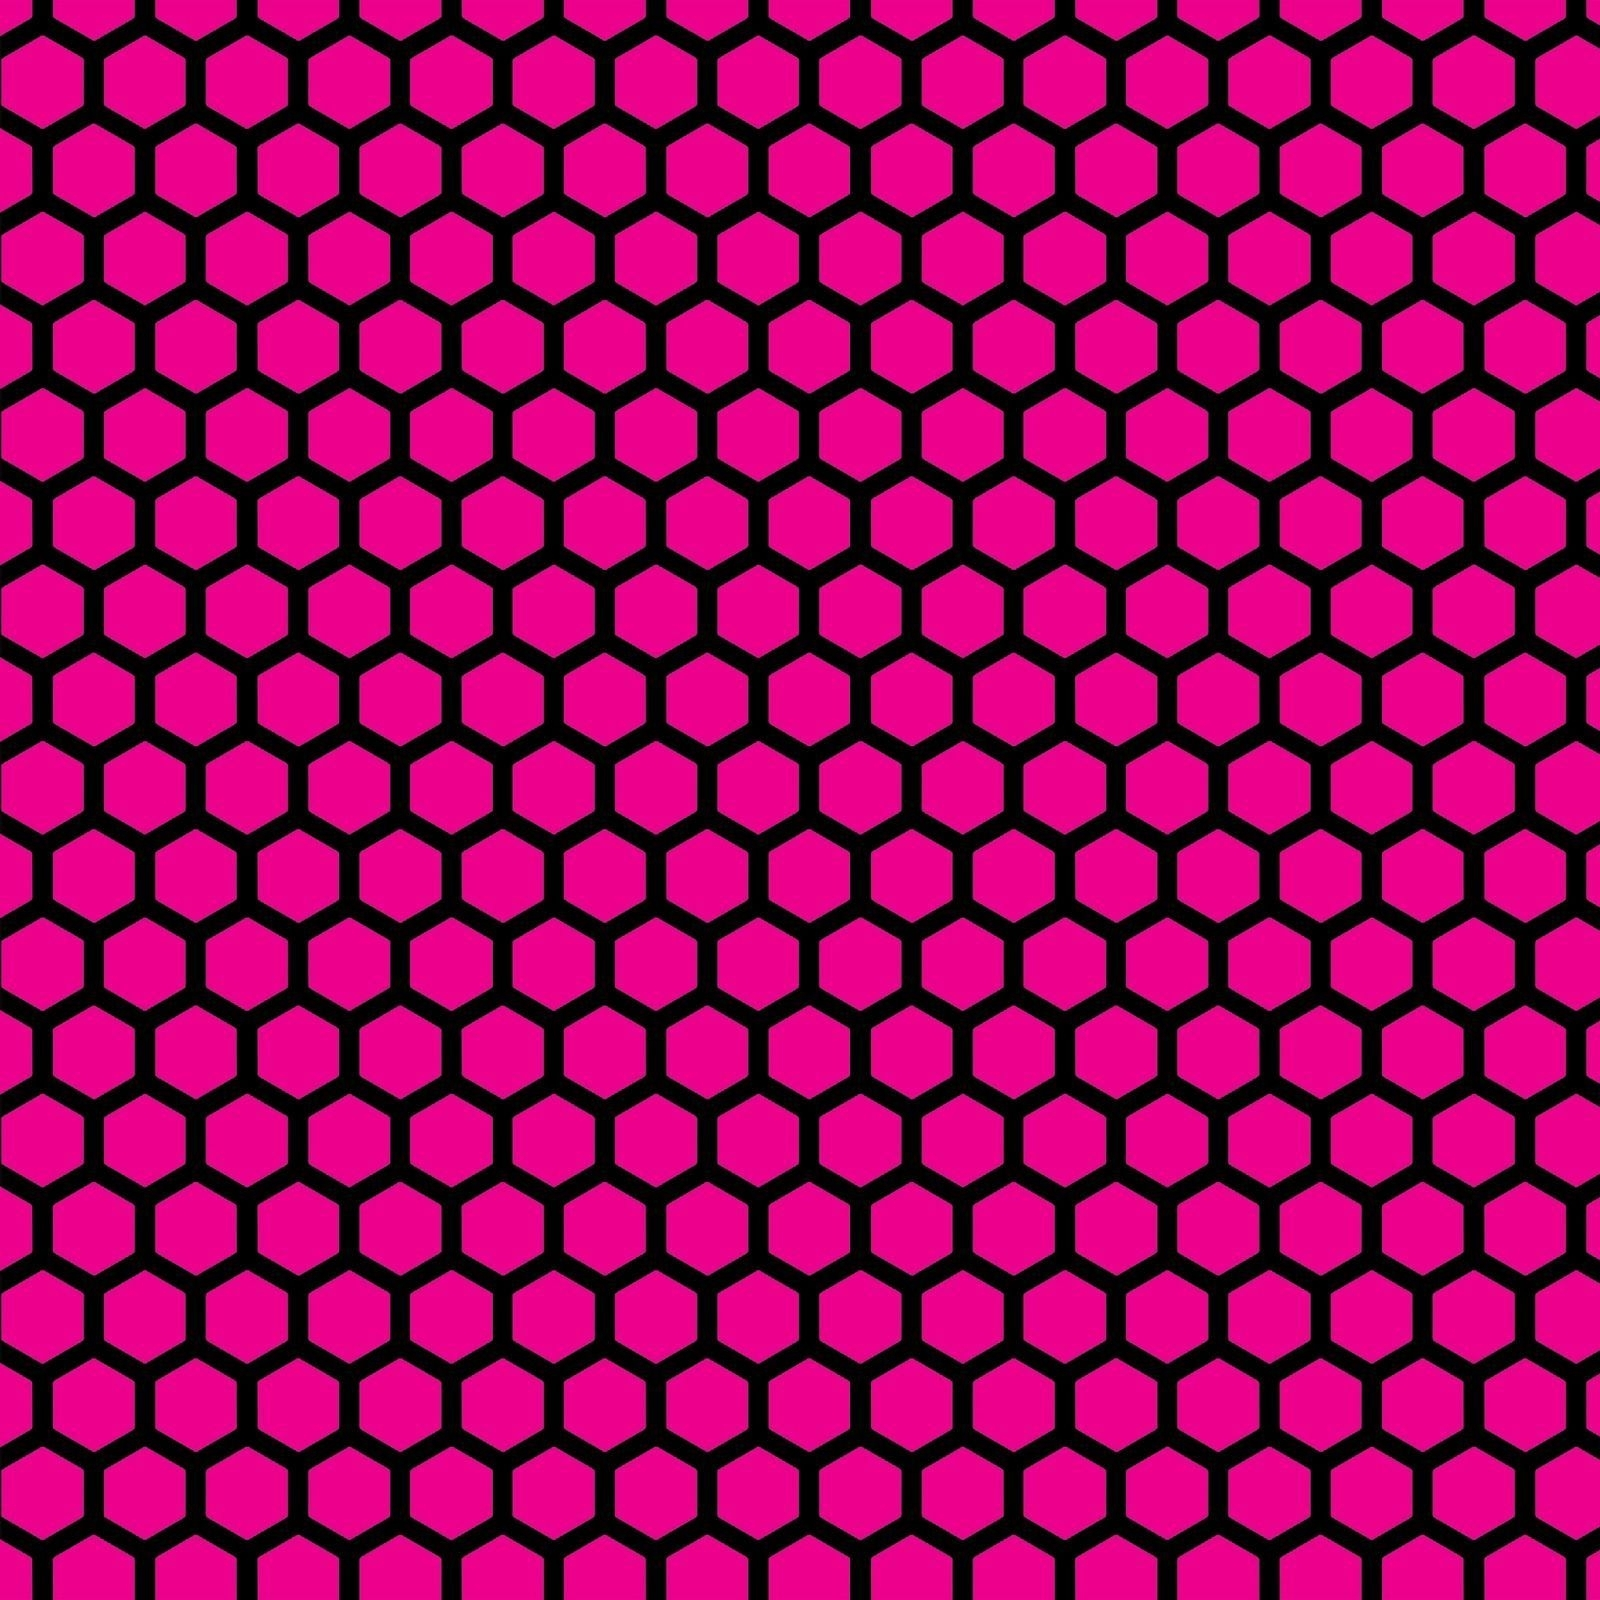 neon pink wallpaper hd u2013 wallpapermonkey   wallpapers